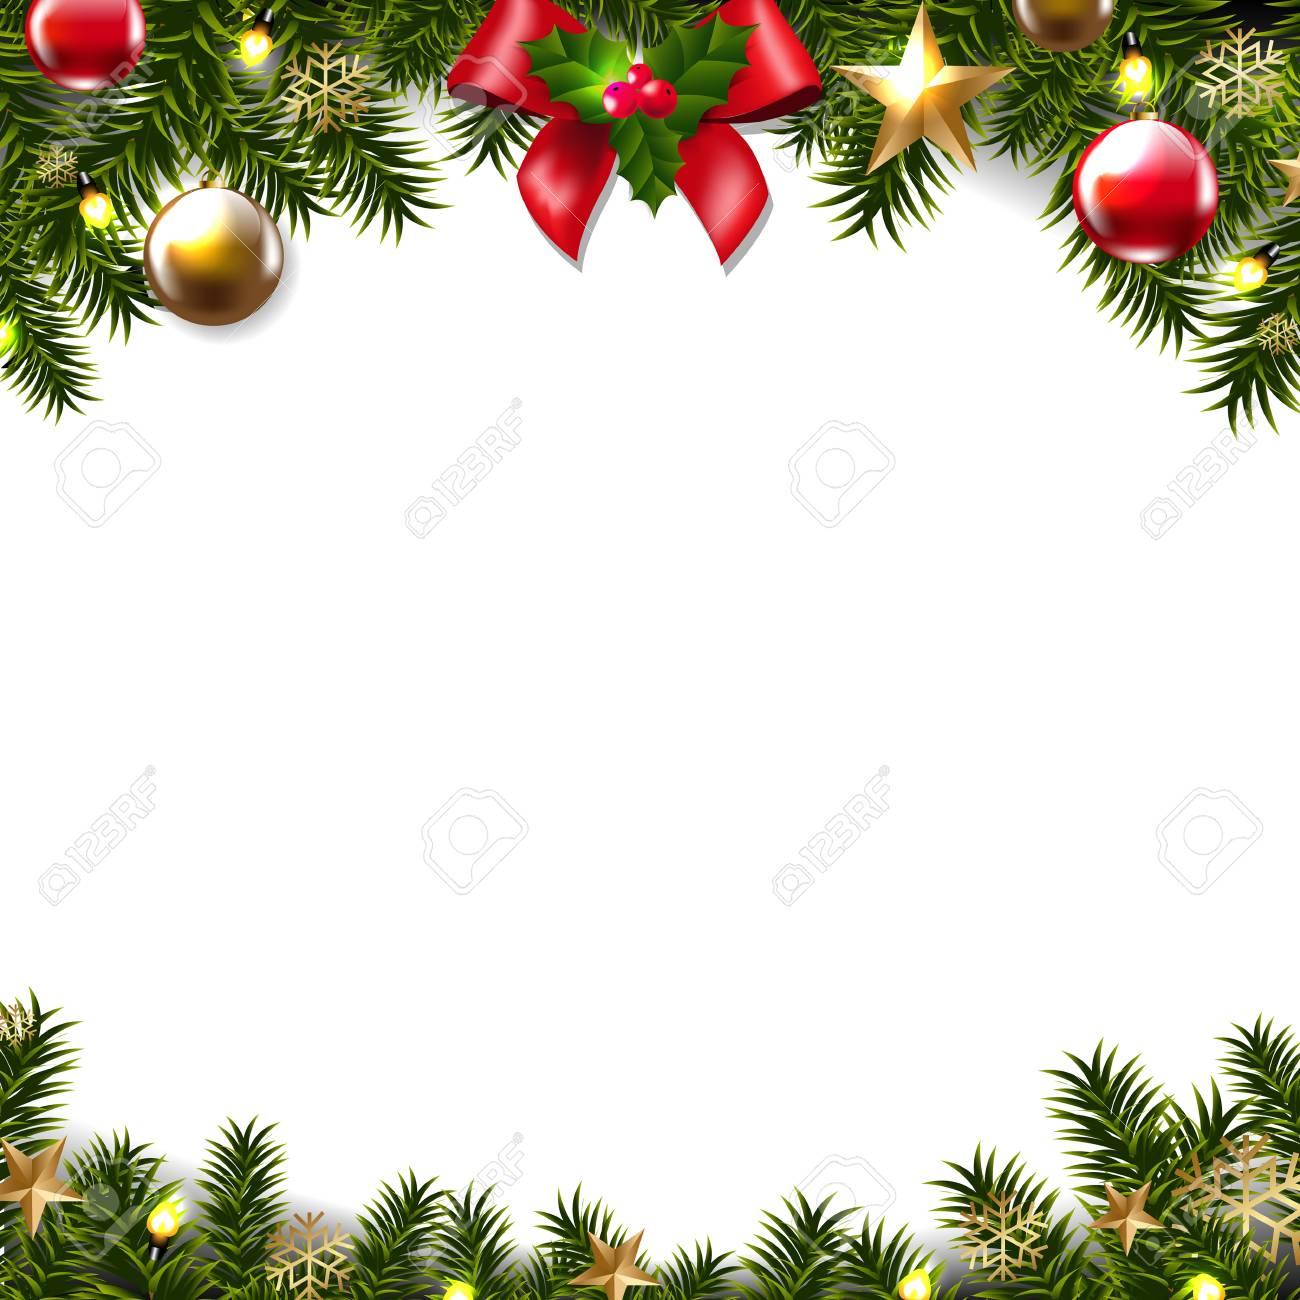 Christmas Boarder.Christmas Border Design